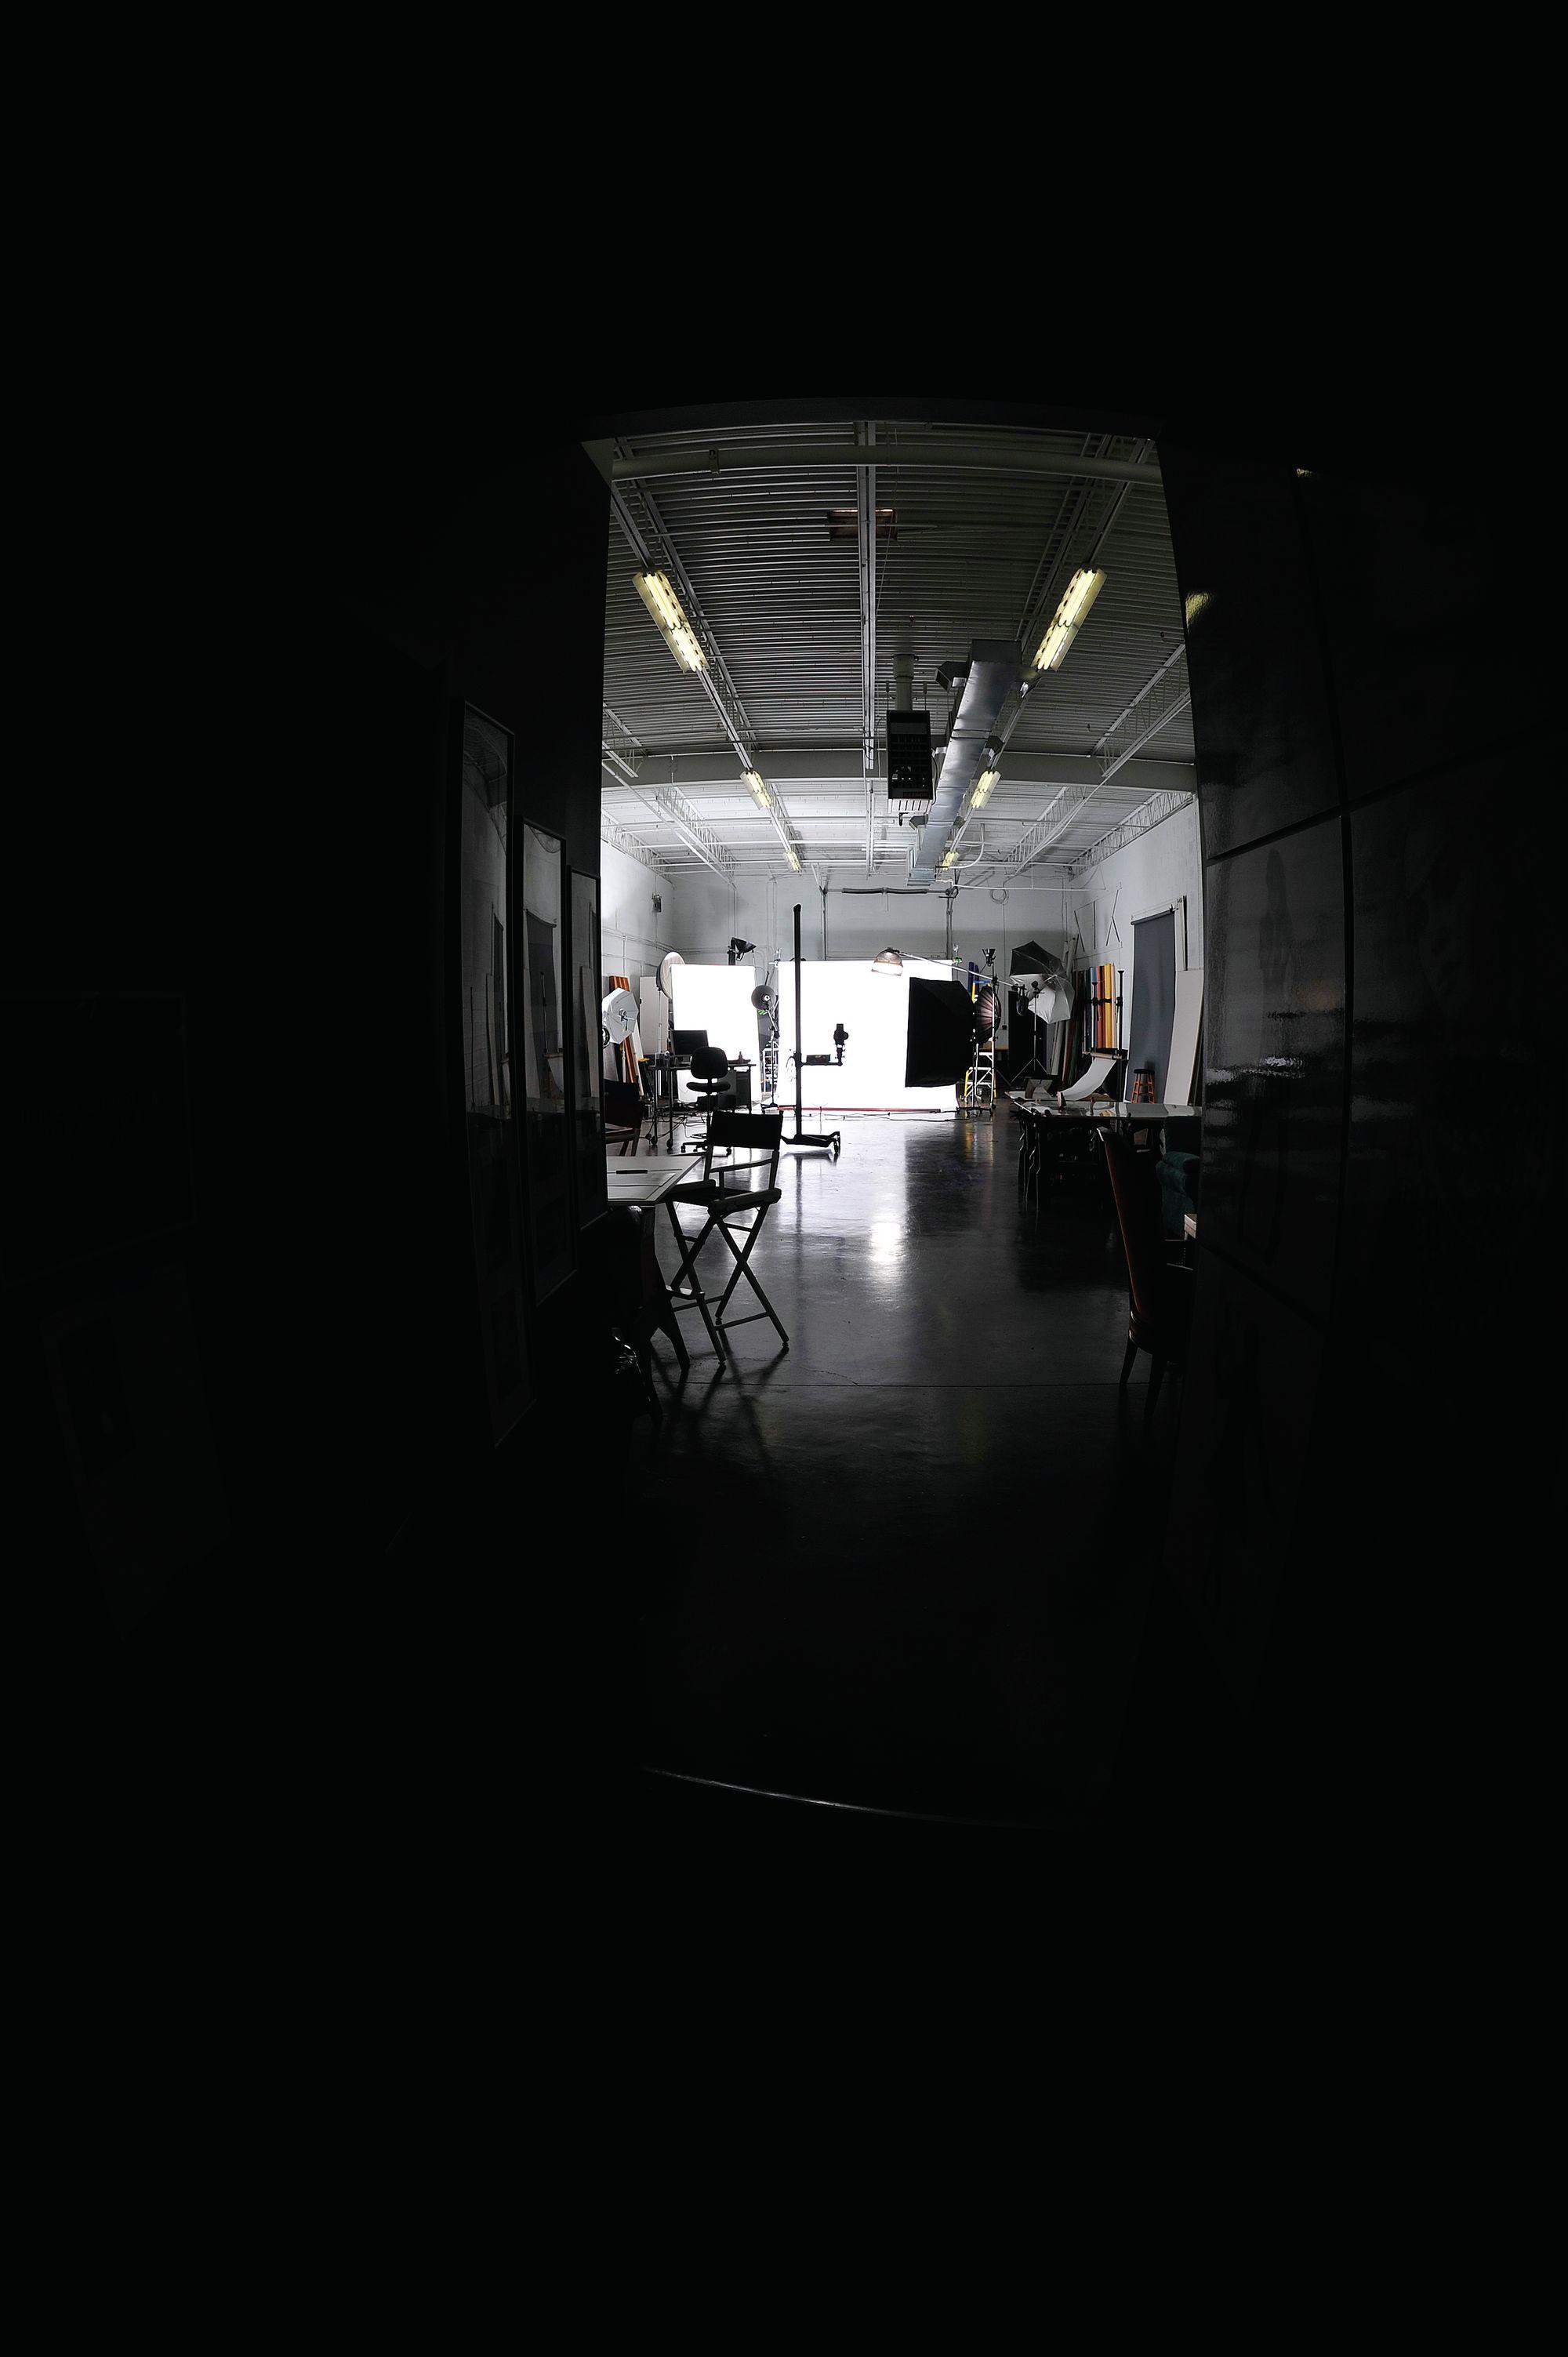 Studio from Hall_DSC9947.jpg